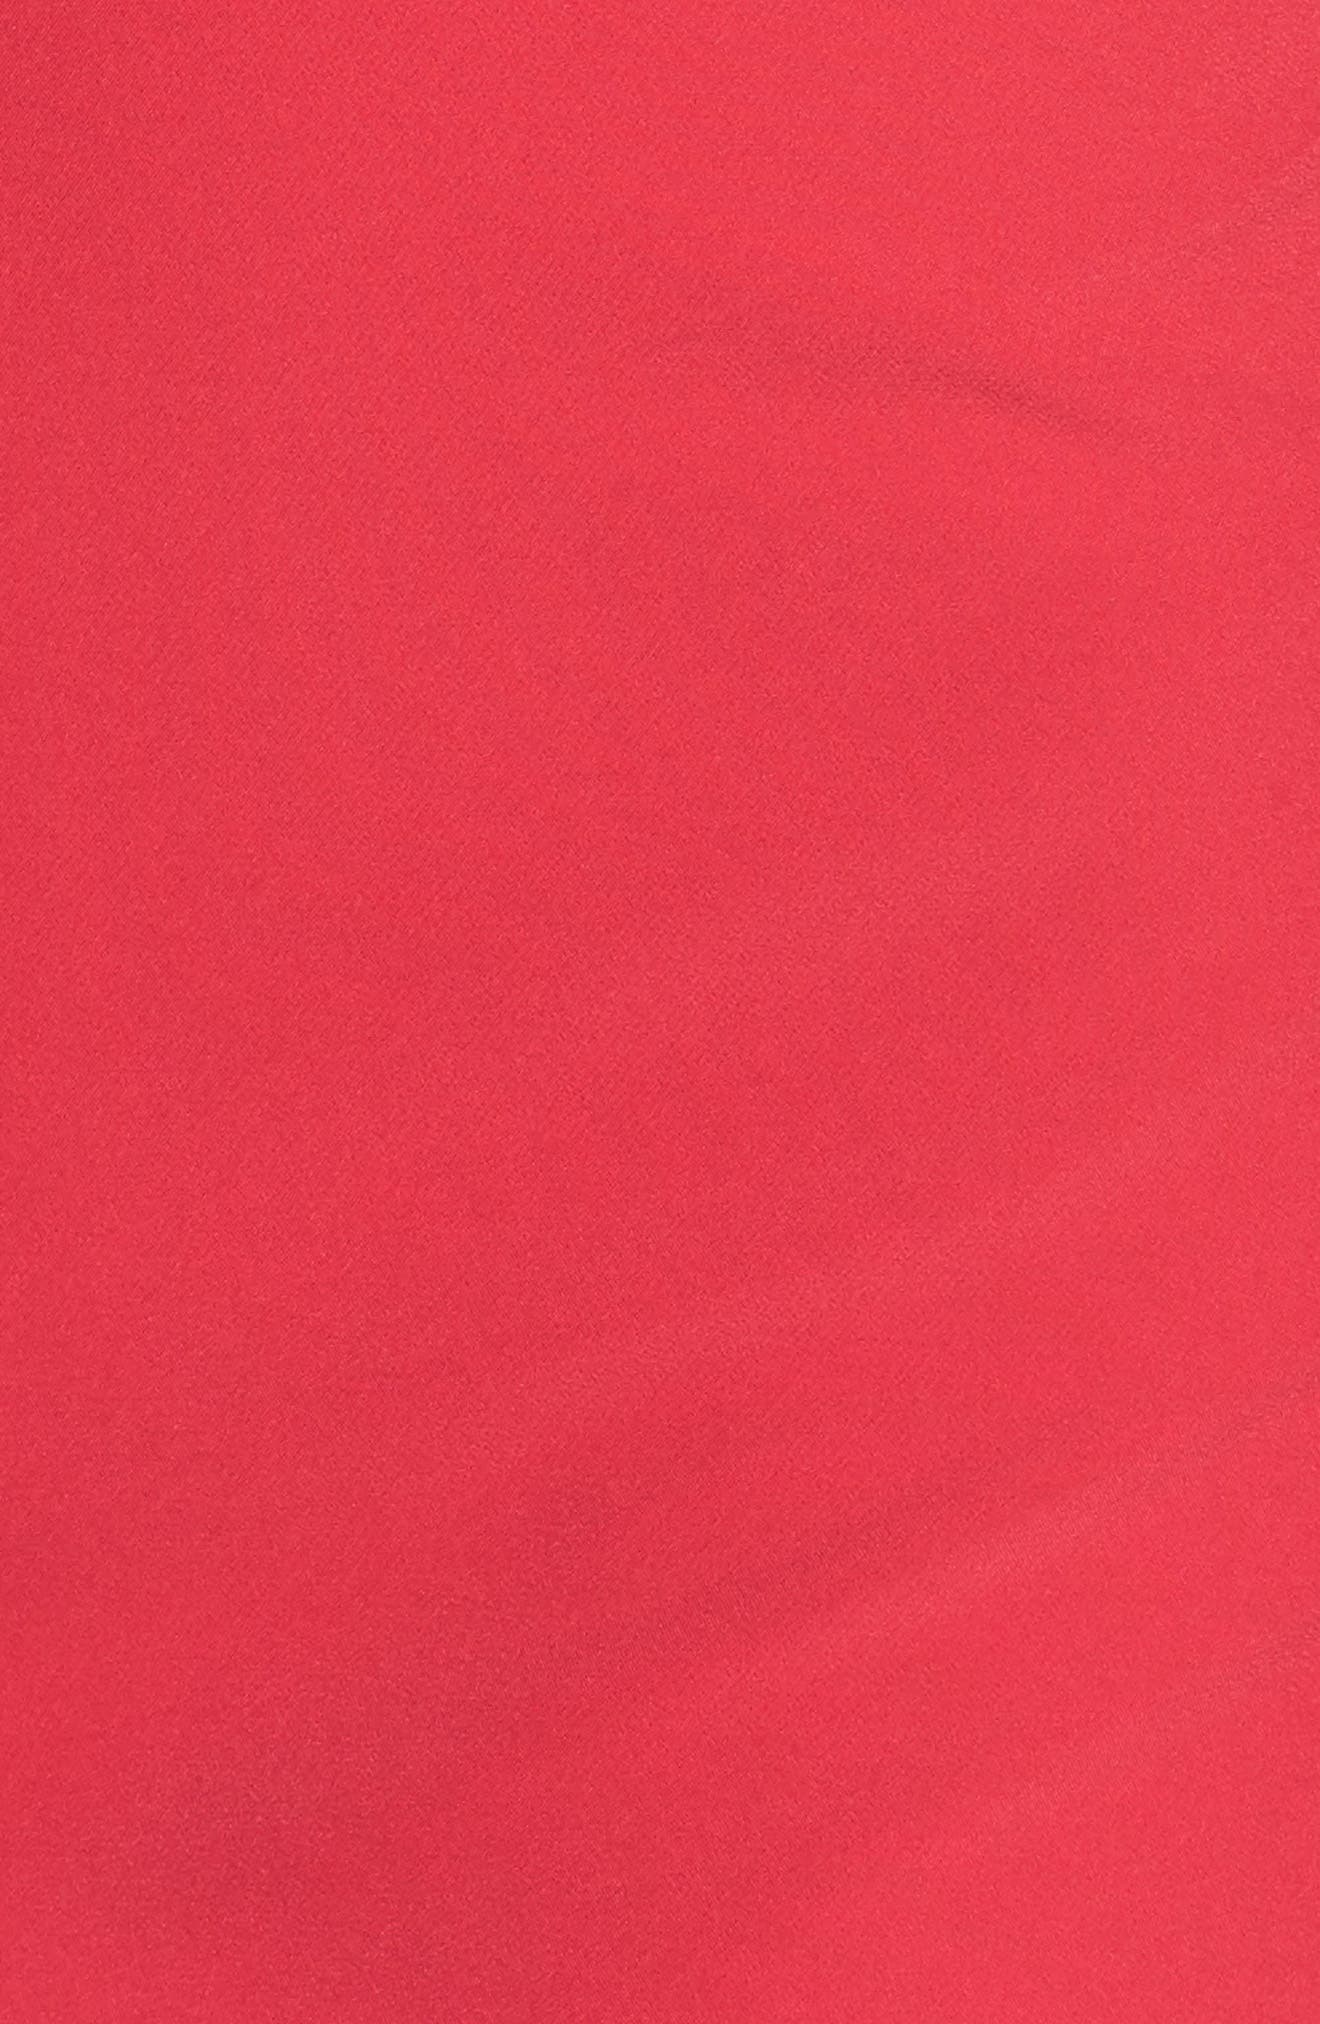 Scallop Sheath Dress,                             Alternate thumbnail 6, color,                             650